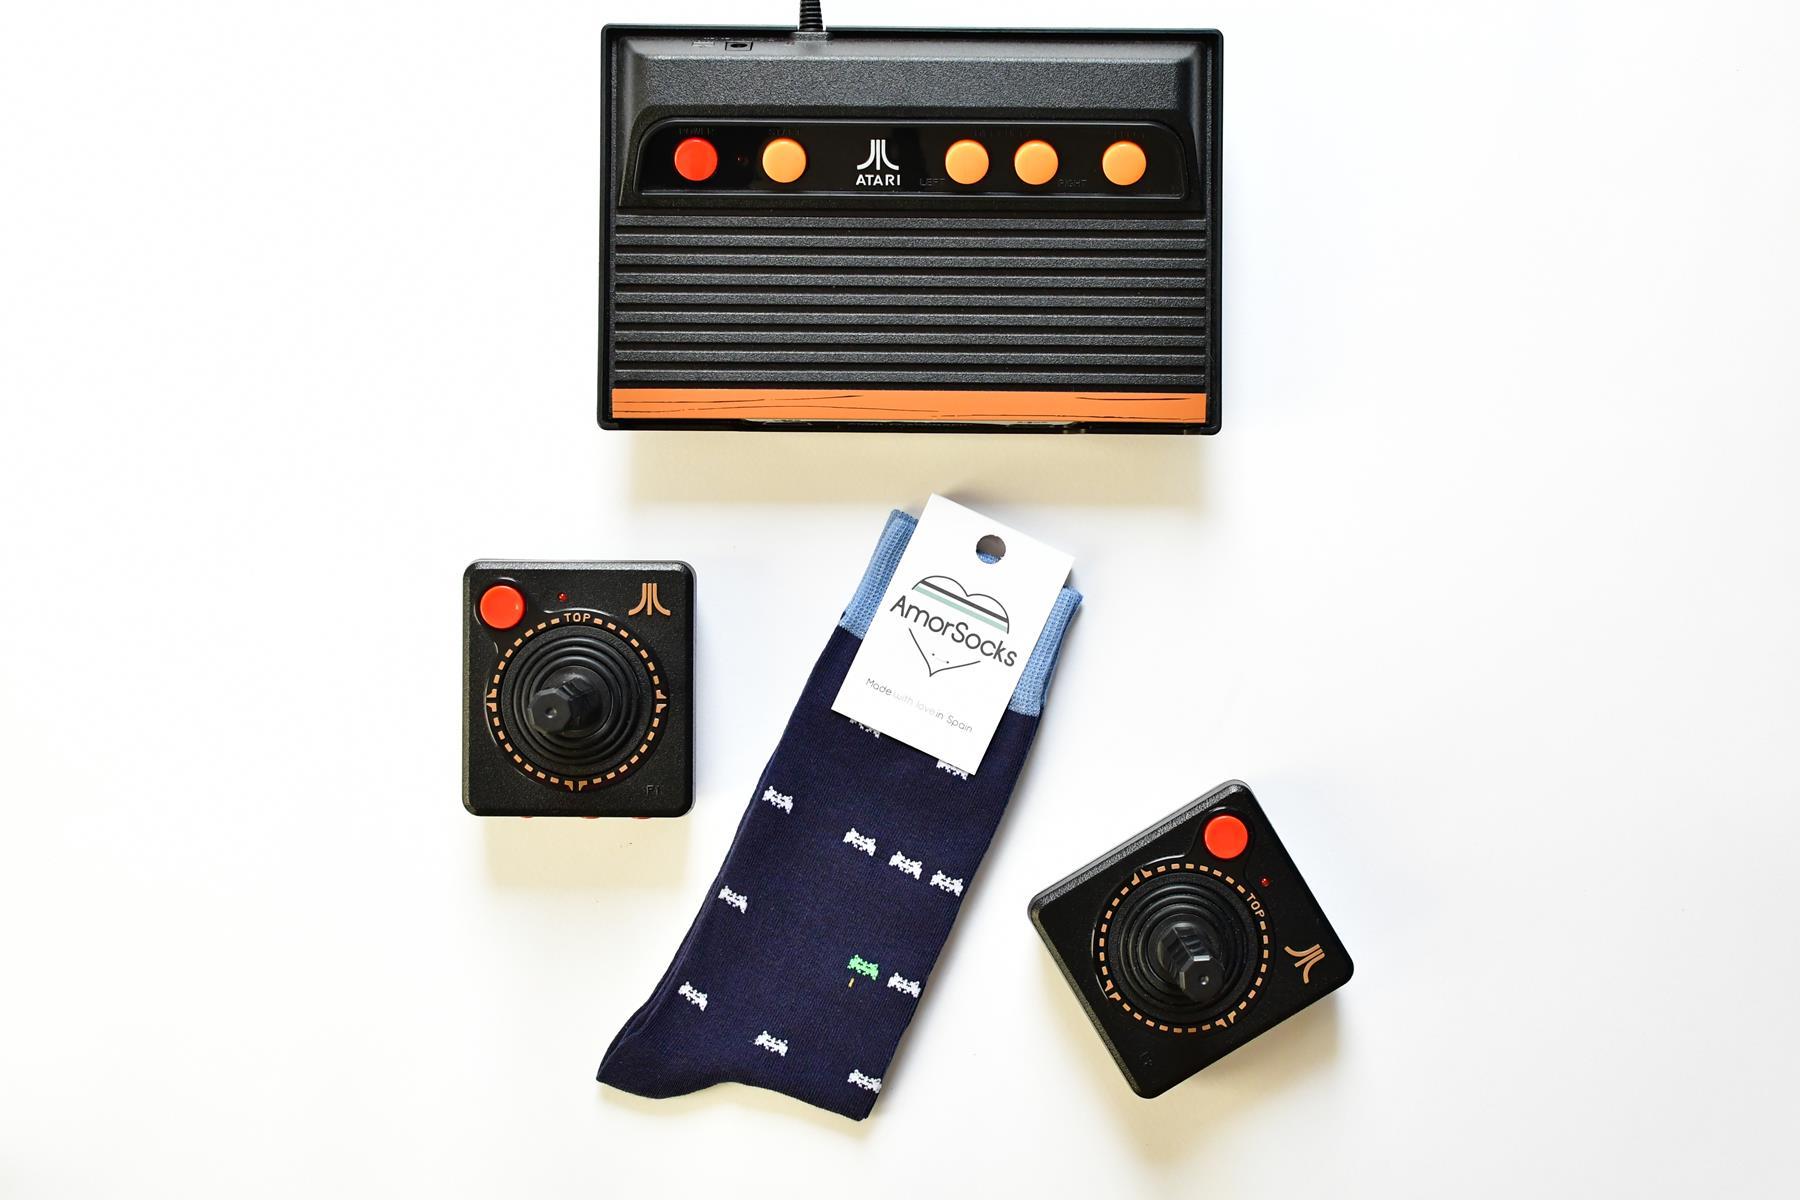 AmorSocks-calcetines-socks-marcianitos-arcade-space-invaders-atari-azul-marino-blanco-verd